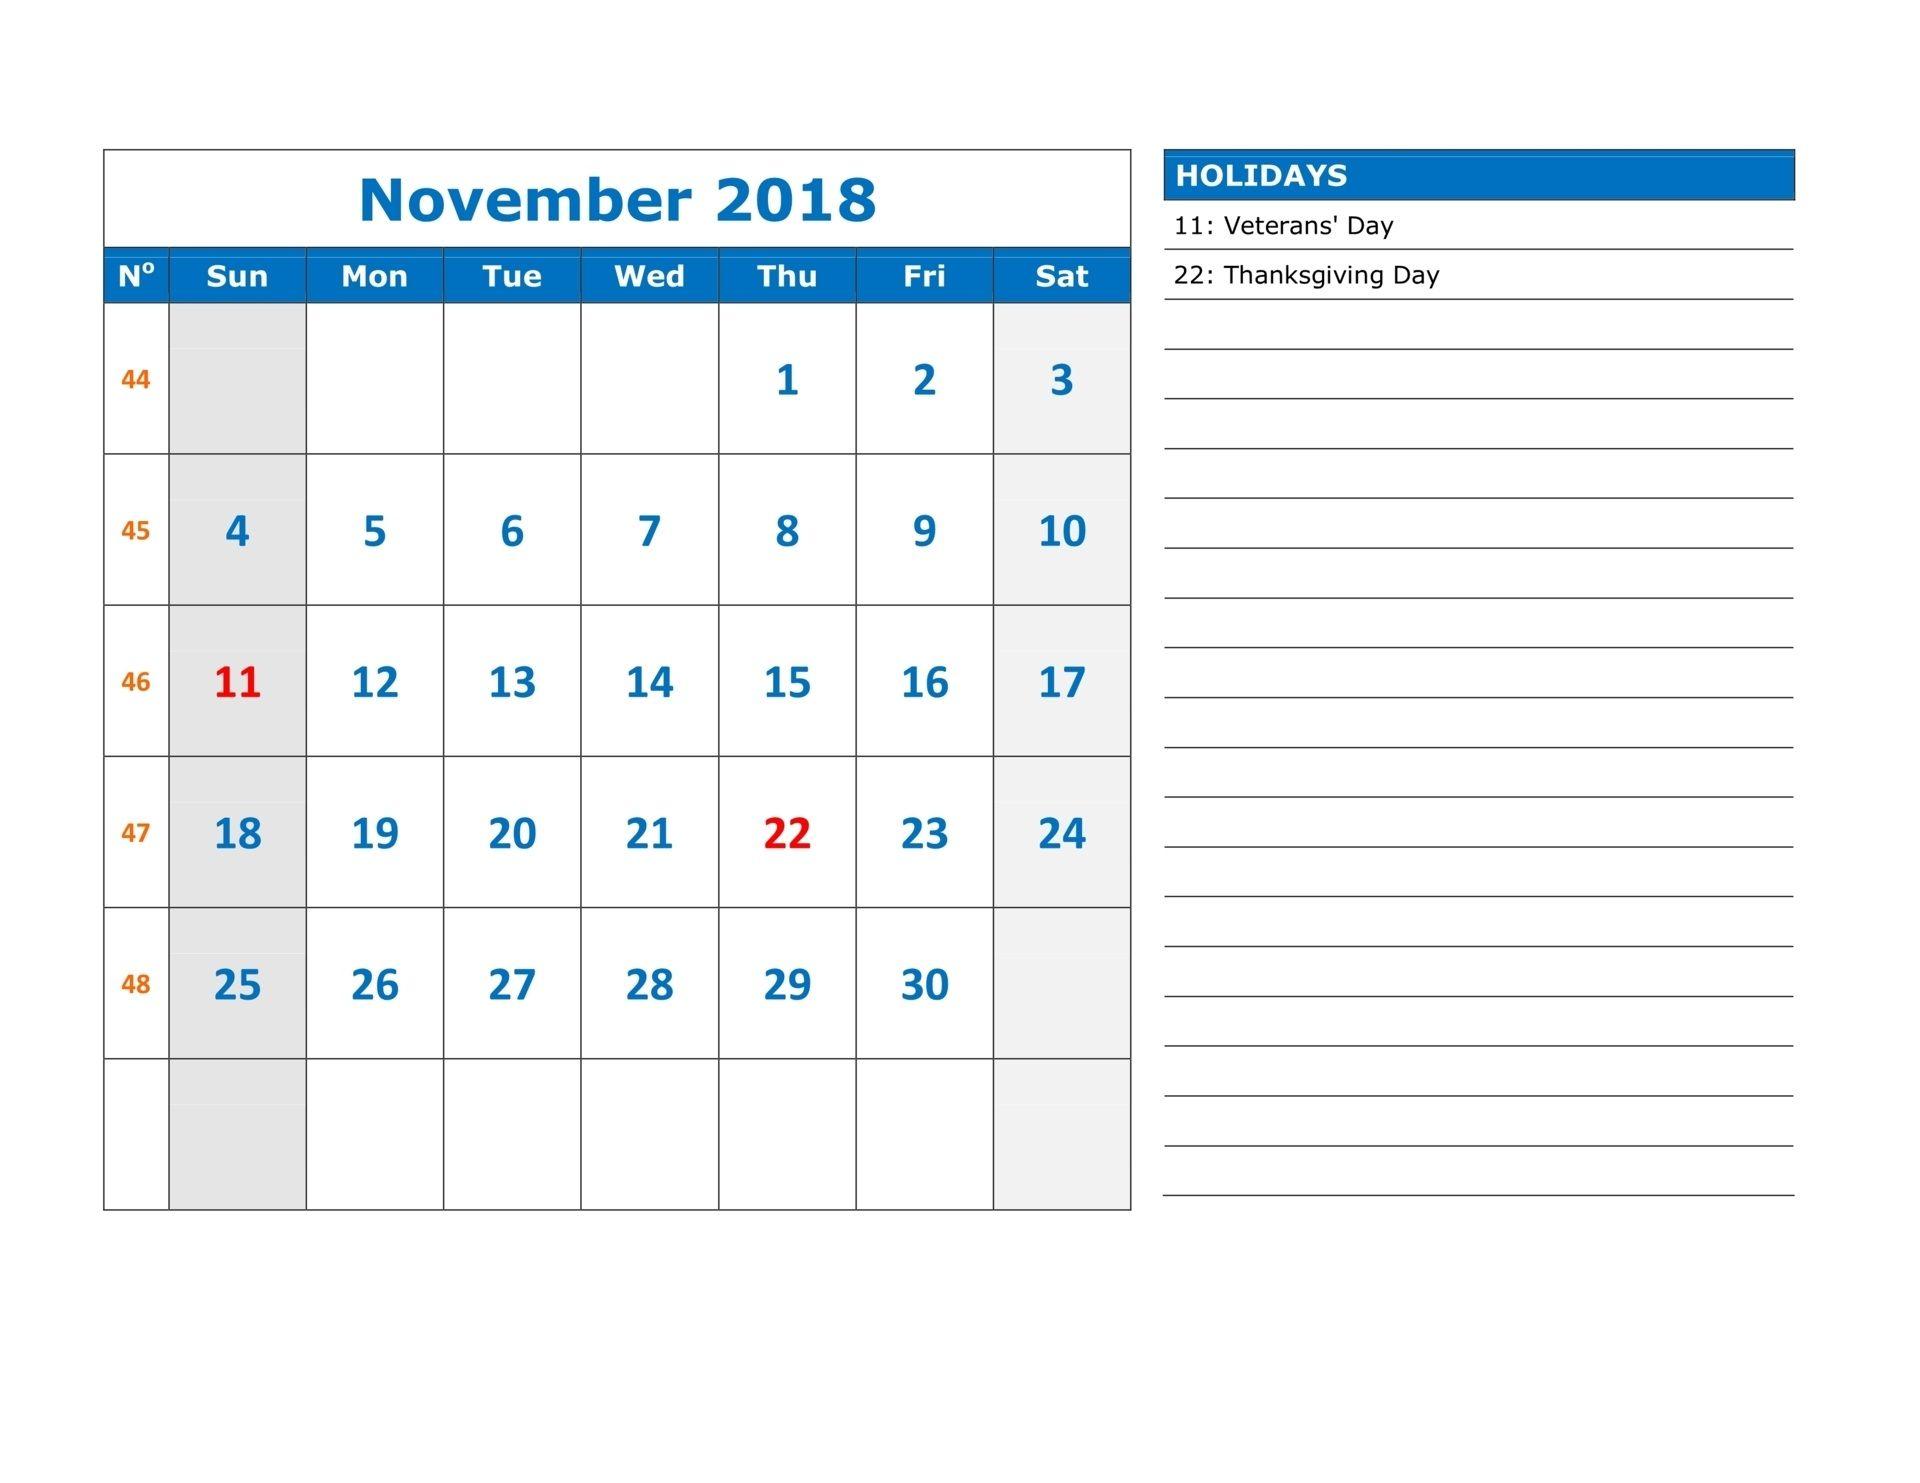 November 2018 Calendar With National Holidays November 2018